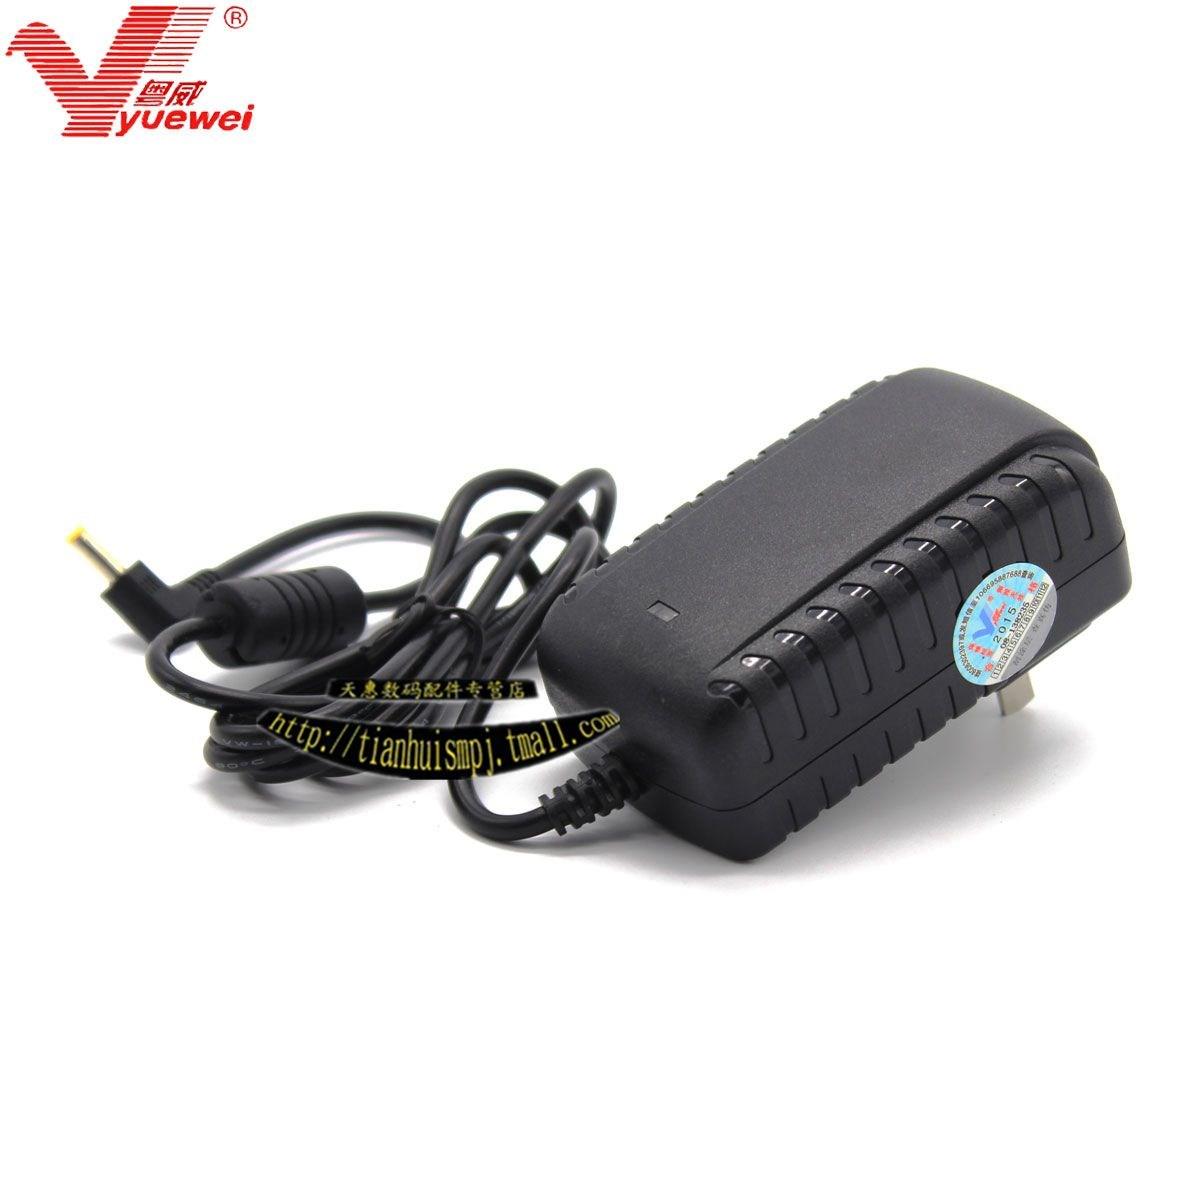 12v2a 移动dvd evd电源适配器led变压器电源 数码像框4.0*1.7mm,可领取元淘宝优惠券